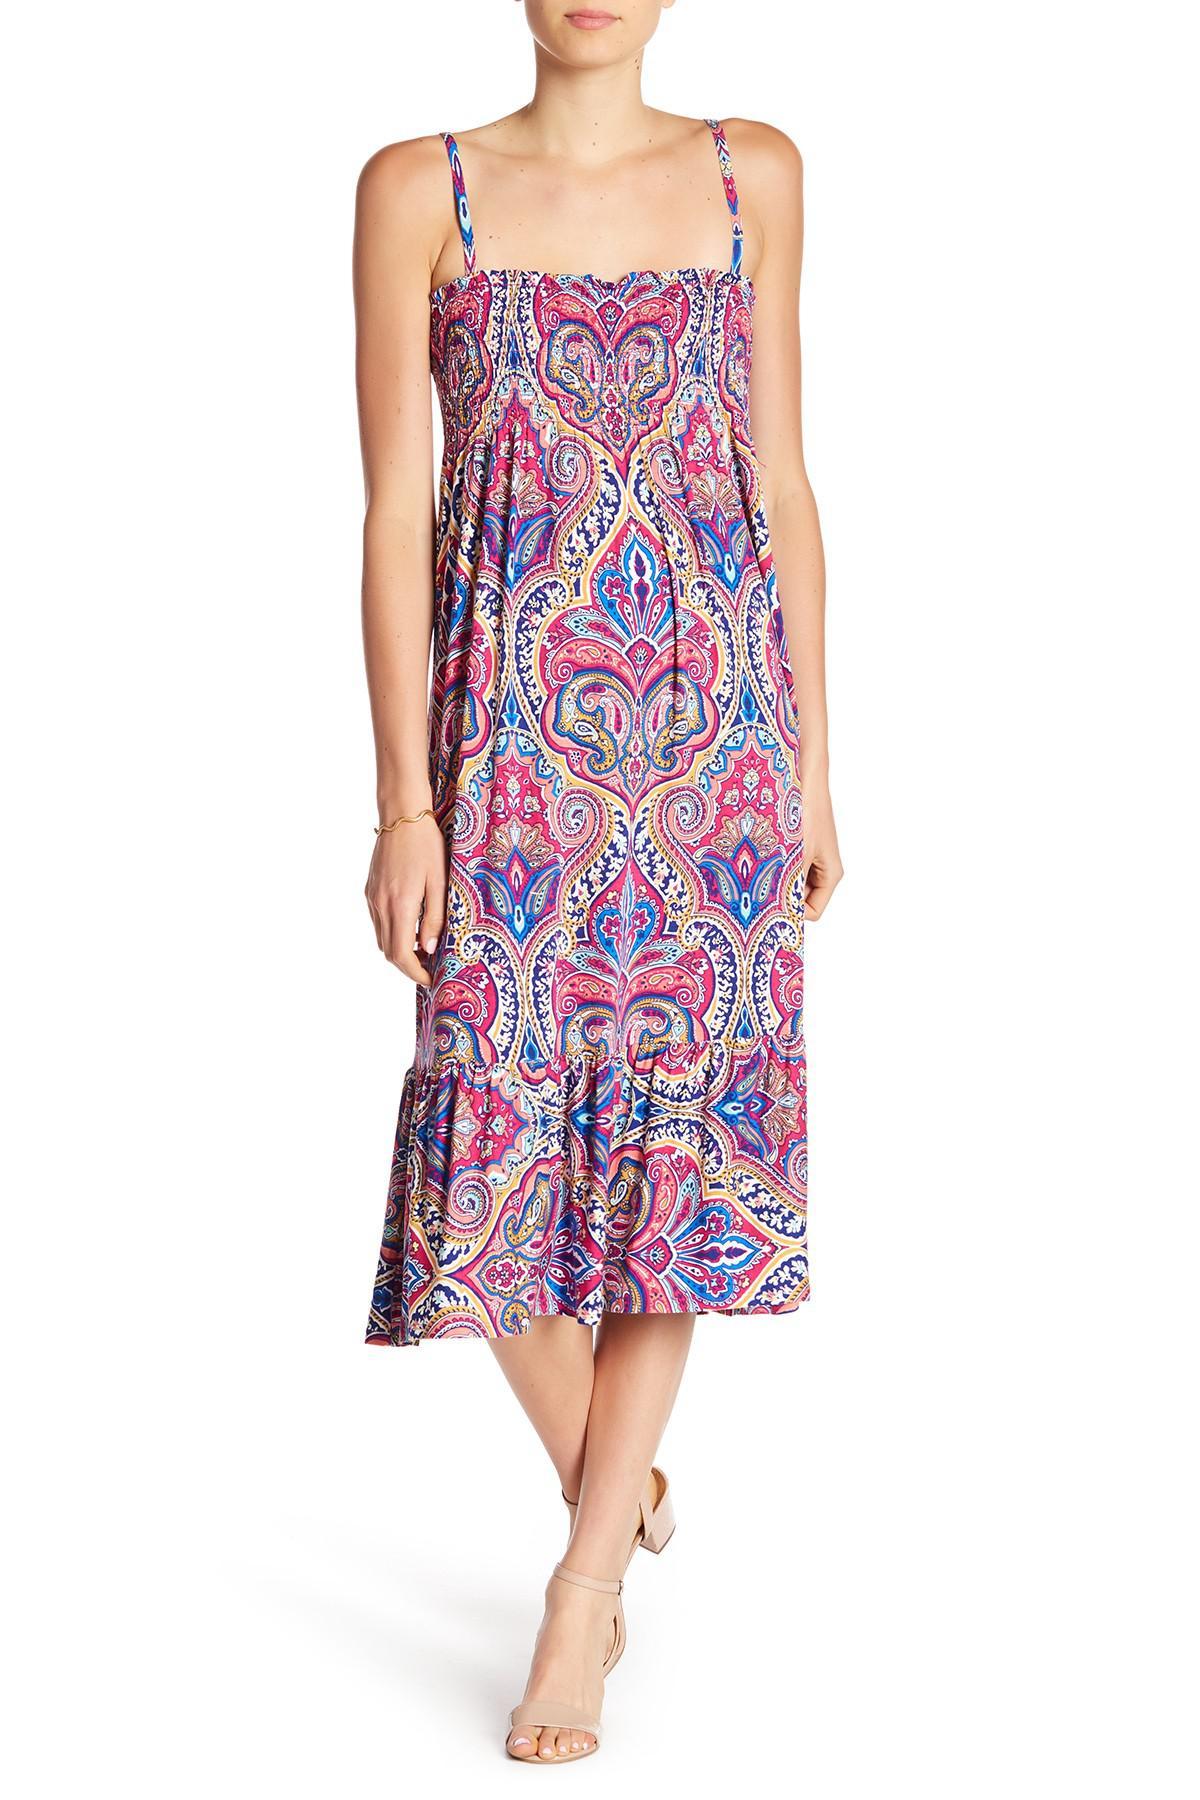 1d3d1047 Nicole Miller Smocked Print Dress - Lyst